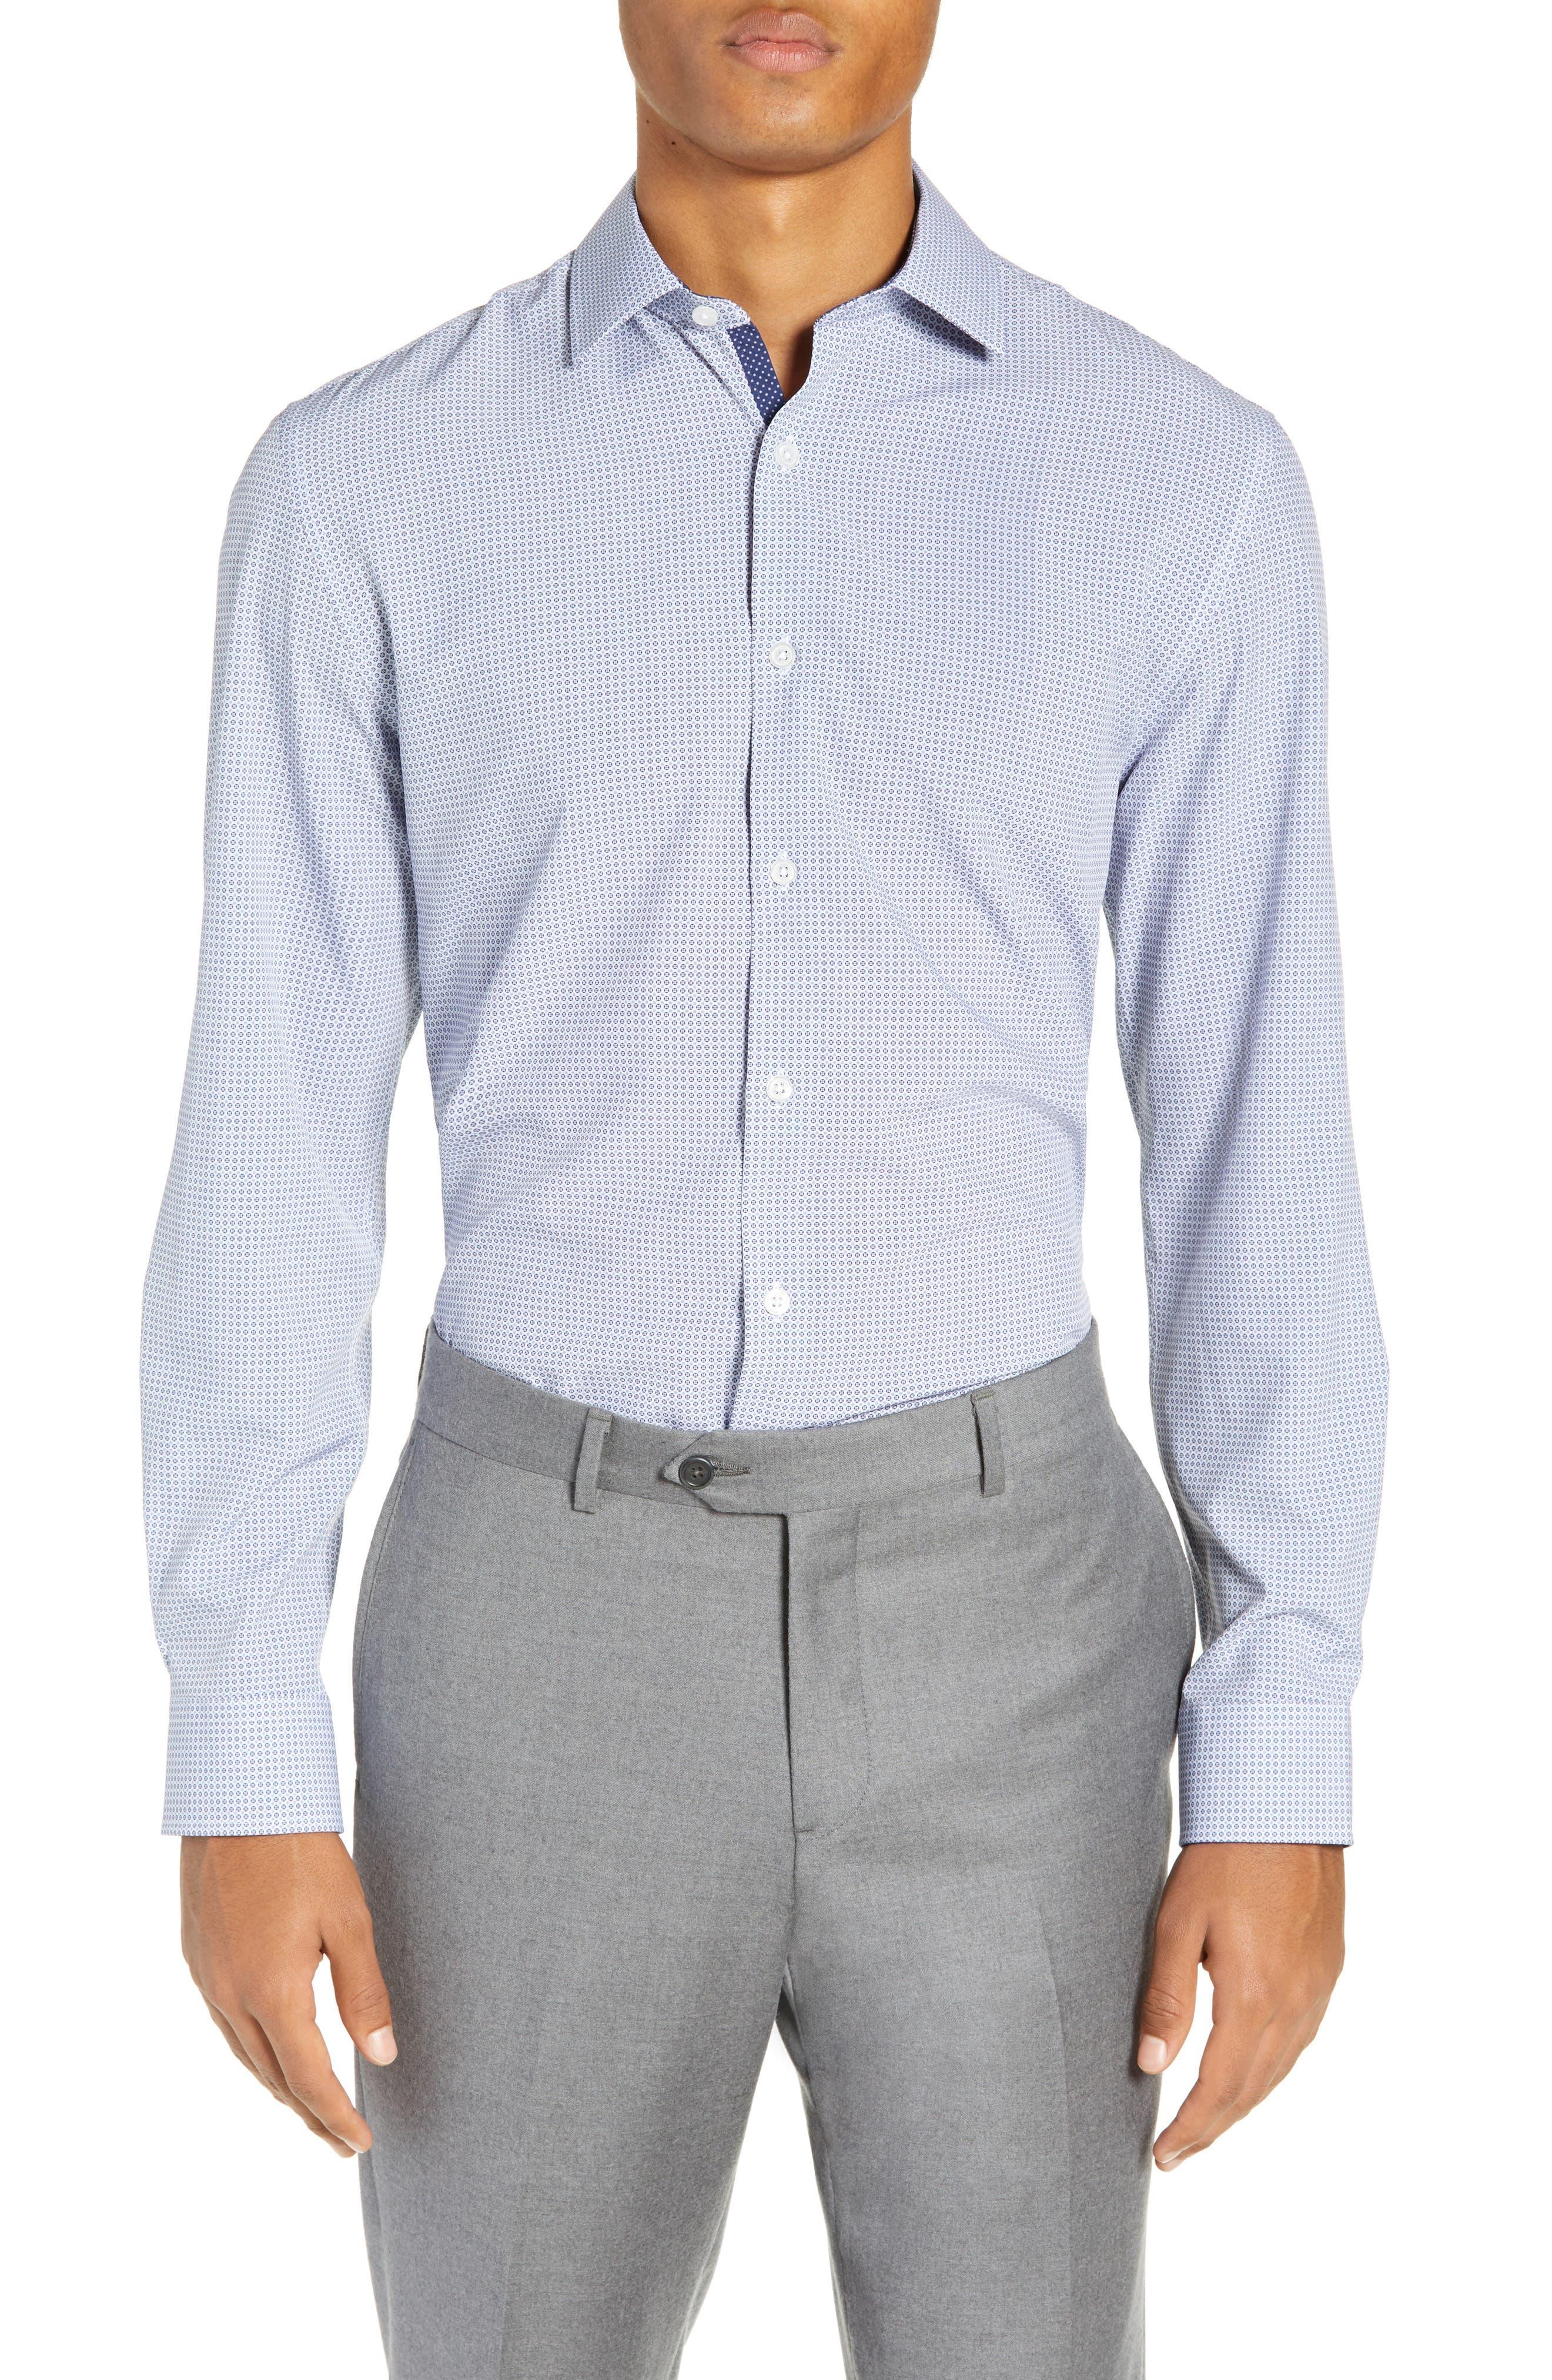 Trim Fit 4-Way Stretch Geometric Dress Shirt,                             Main thumbnail 1, color,                             400